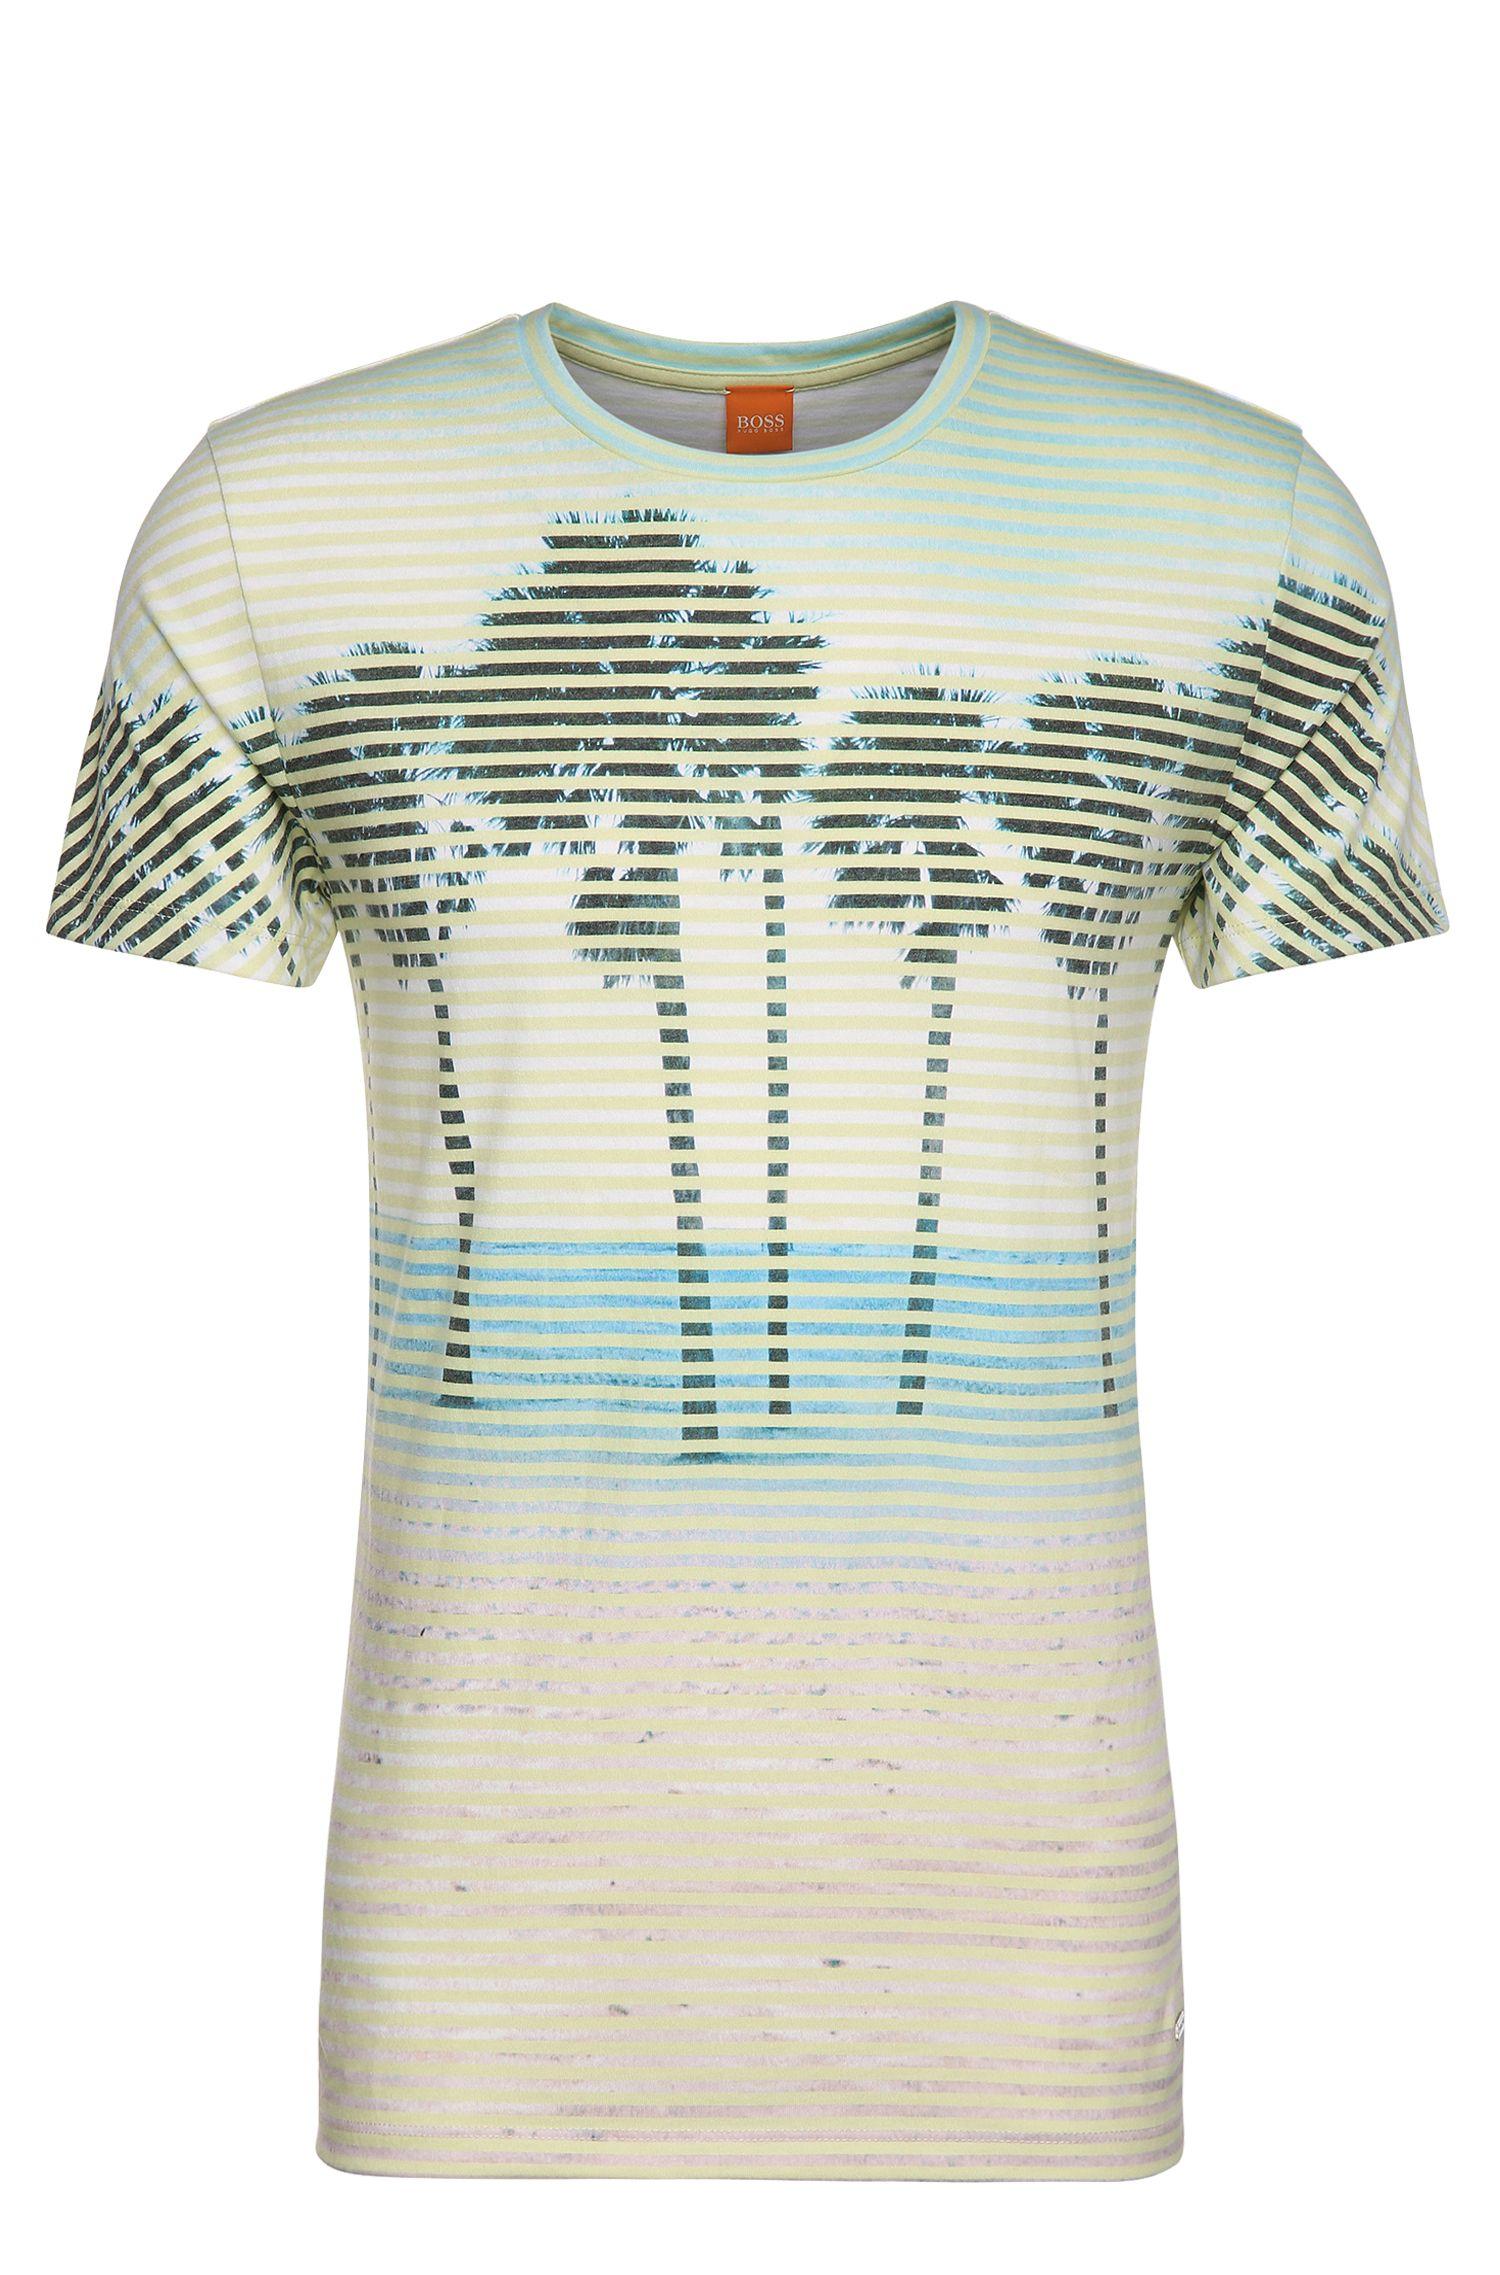 Layered Graphic T-Shirt | Telling